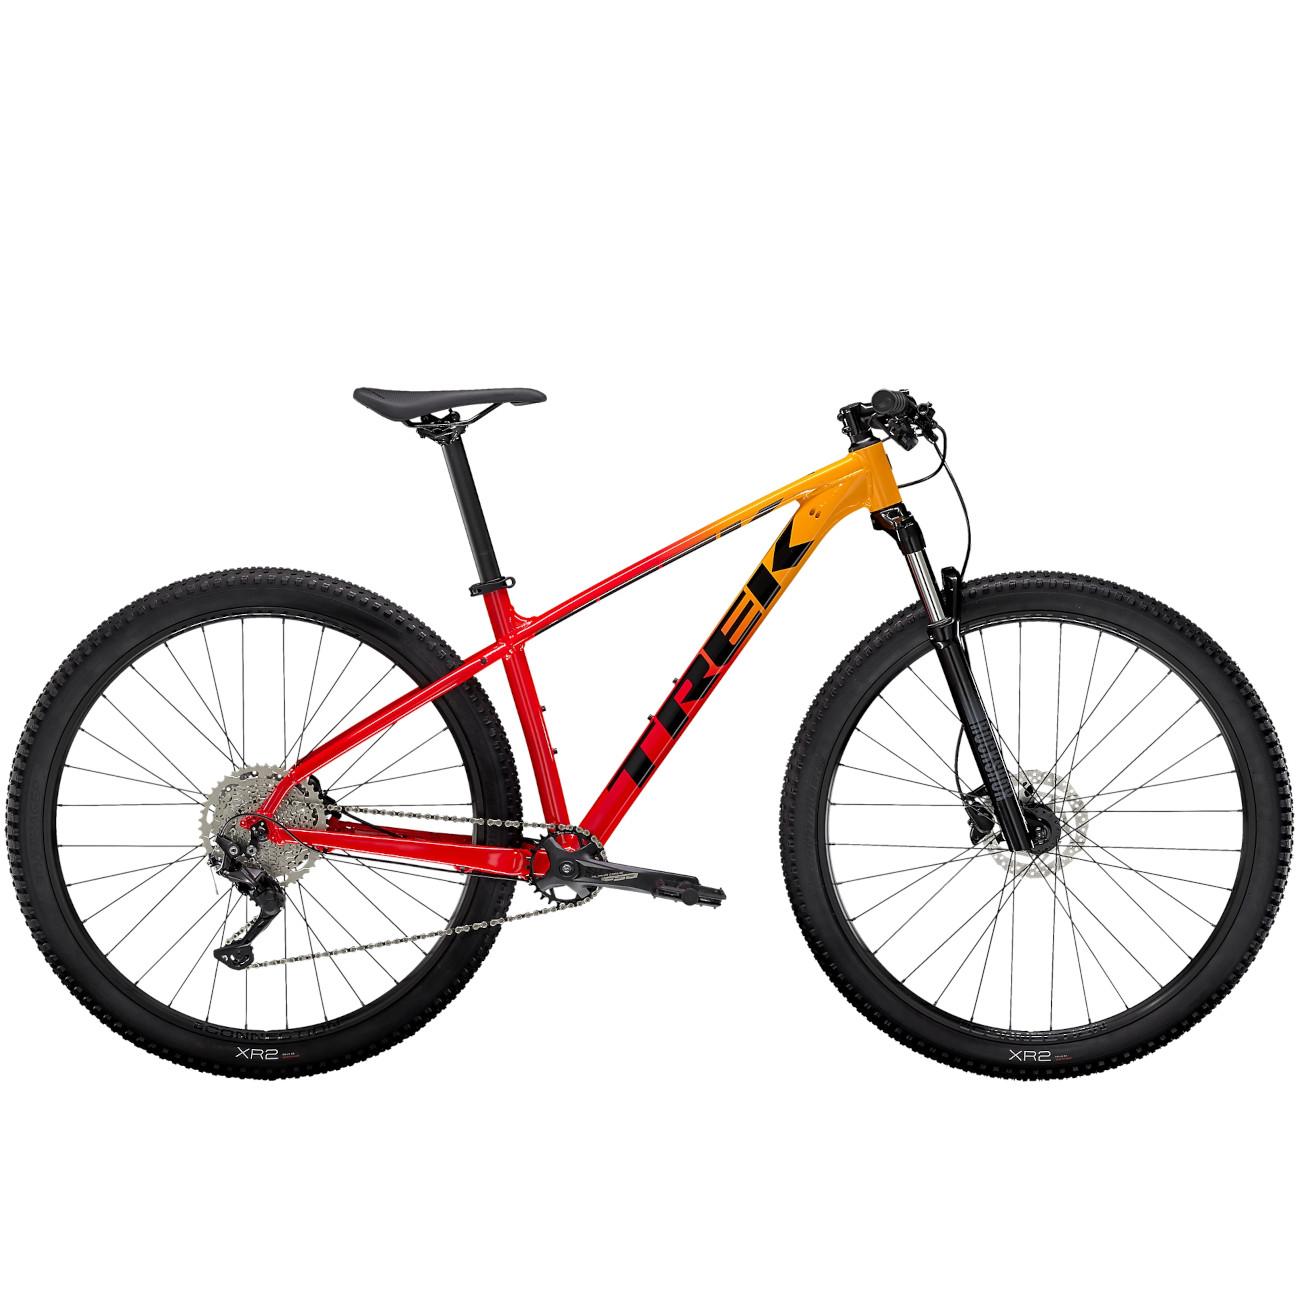 Trek MARLIN 7 Mountainbike - 2022 - Marigold to Radioactive Red Fade